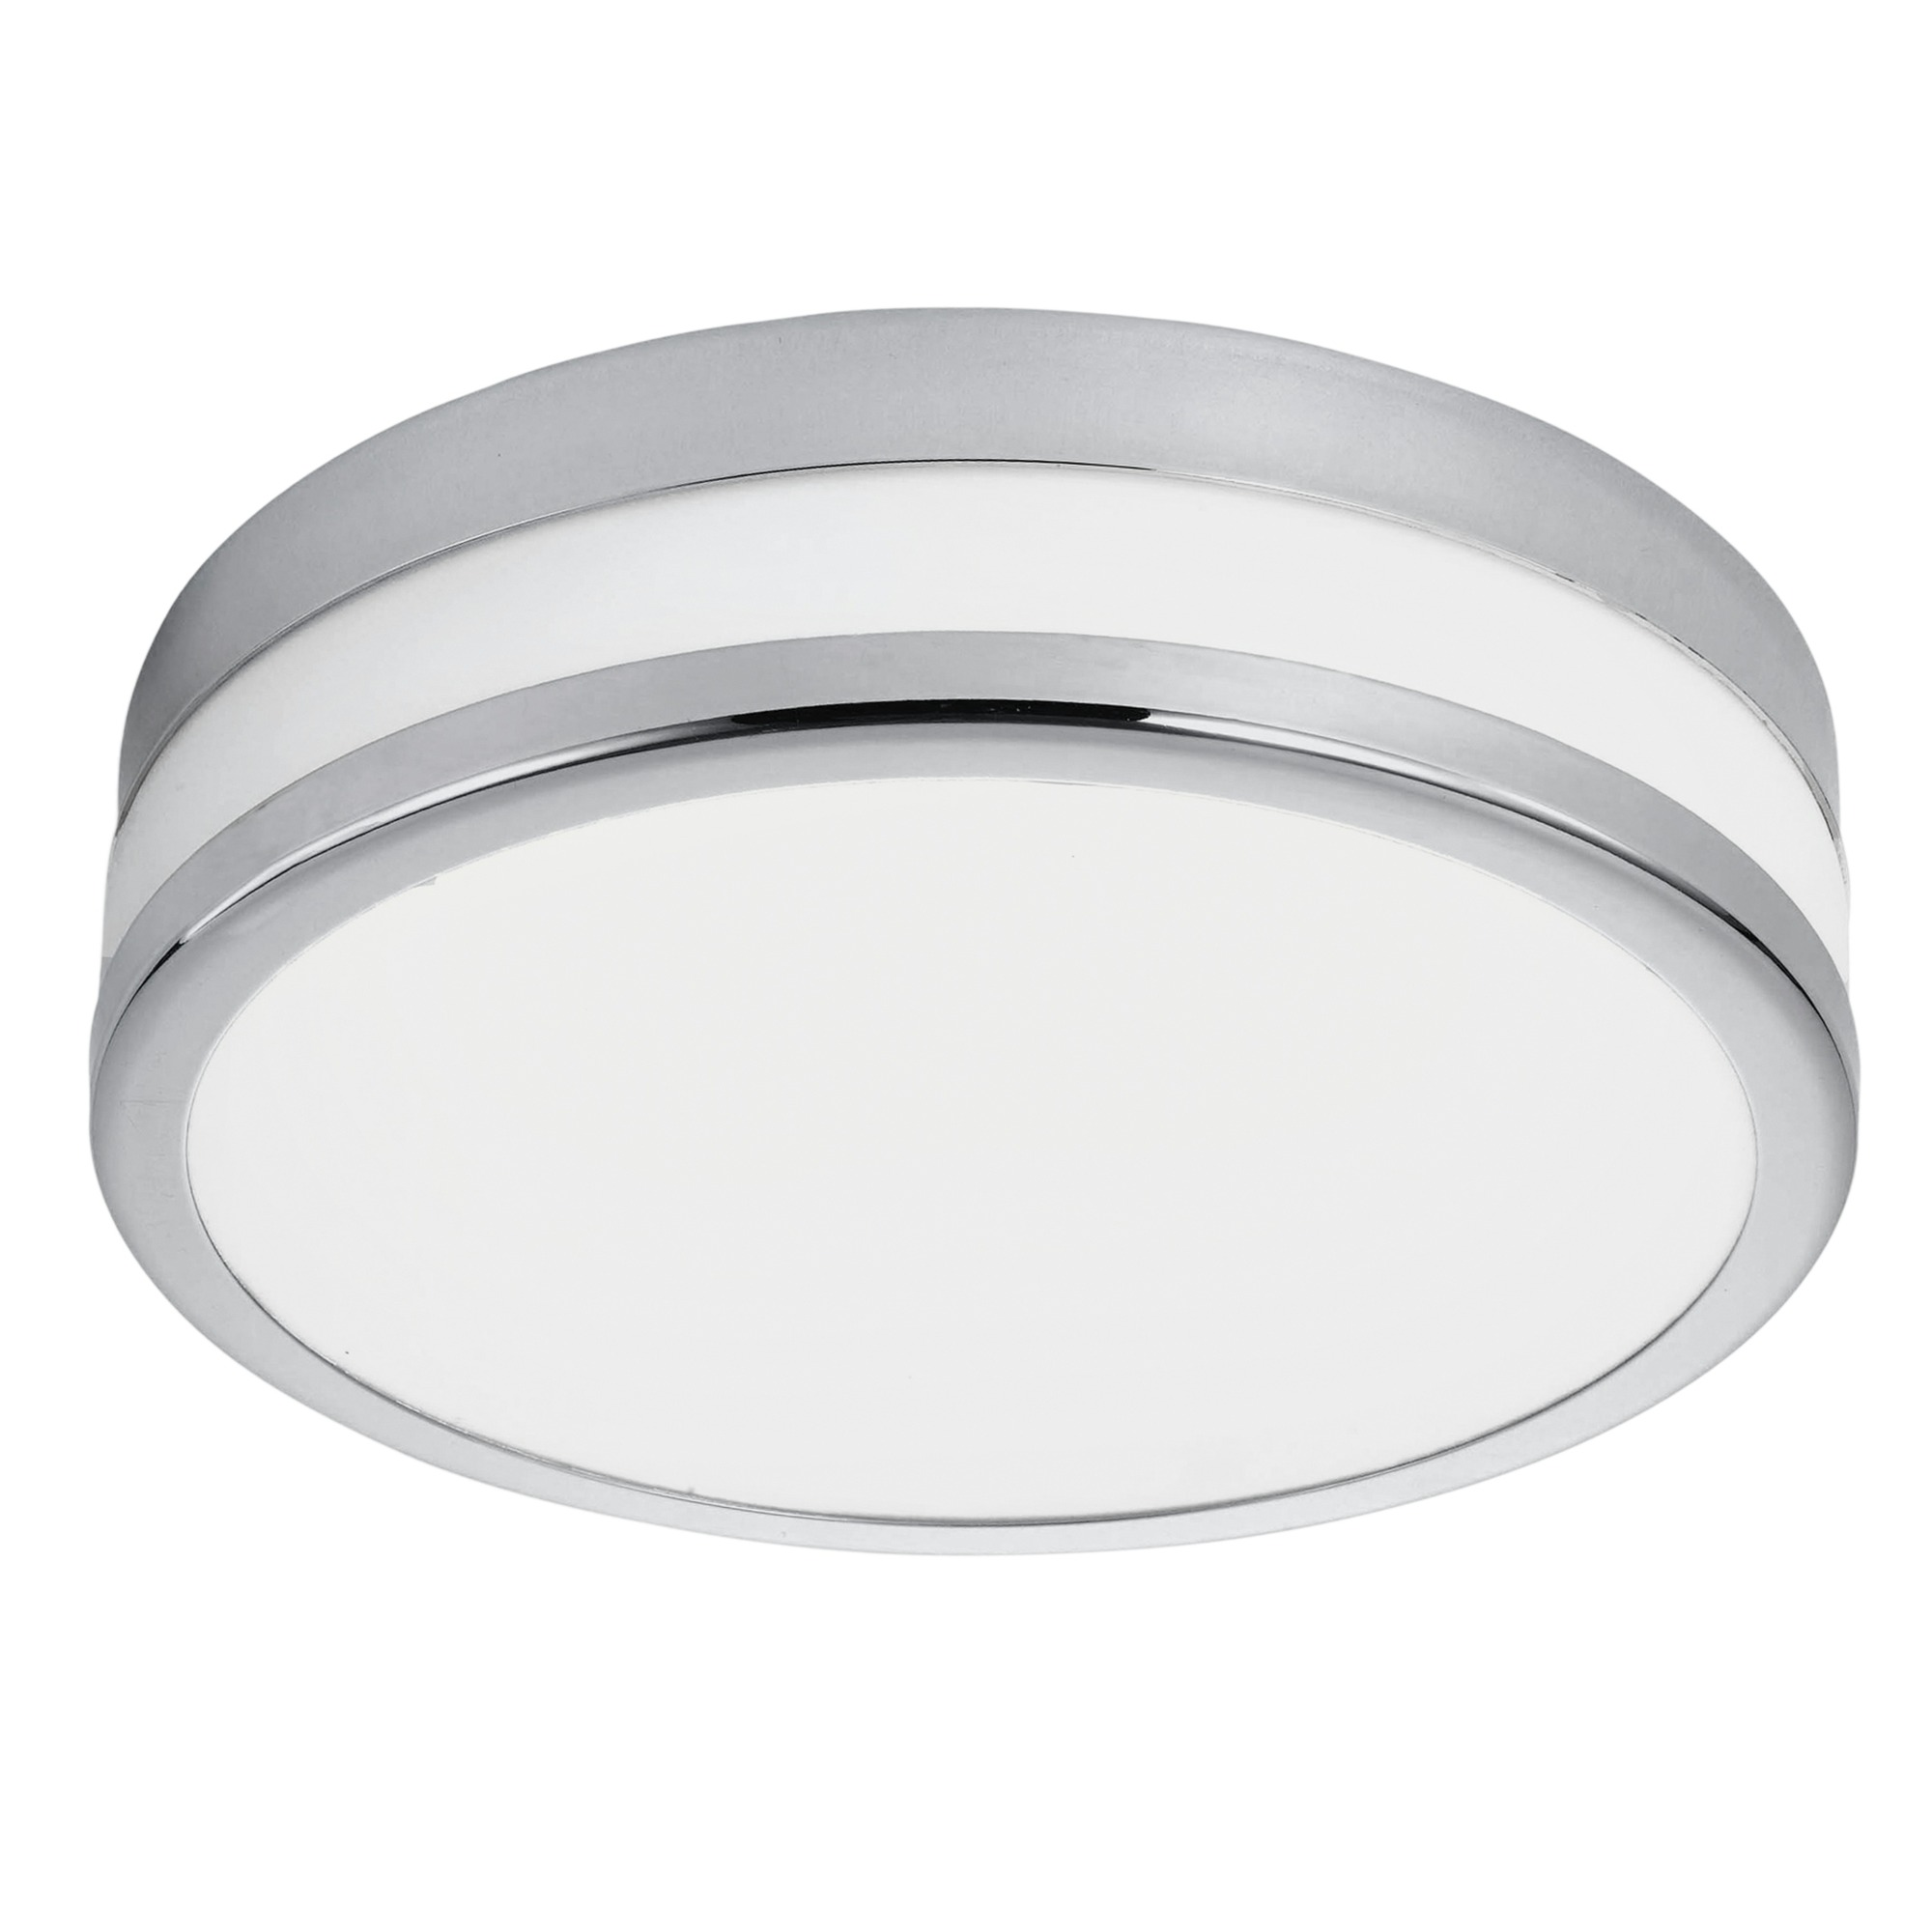 plafonniere dm225 chroom LED PALERMO